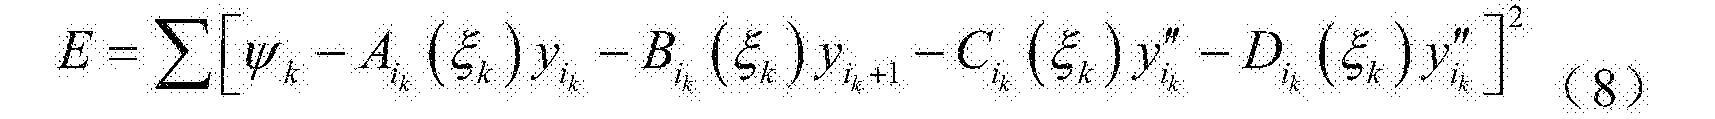 Figure CN106390220AD00373